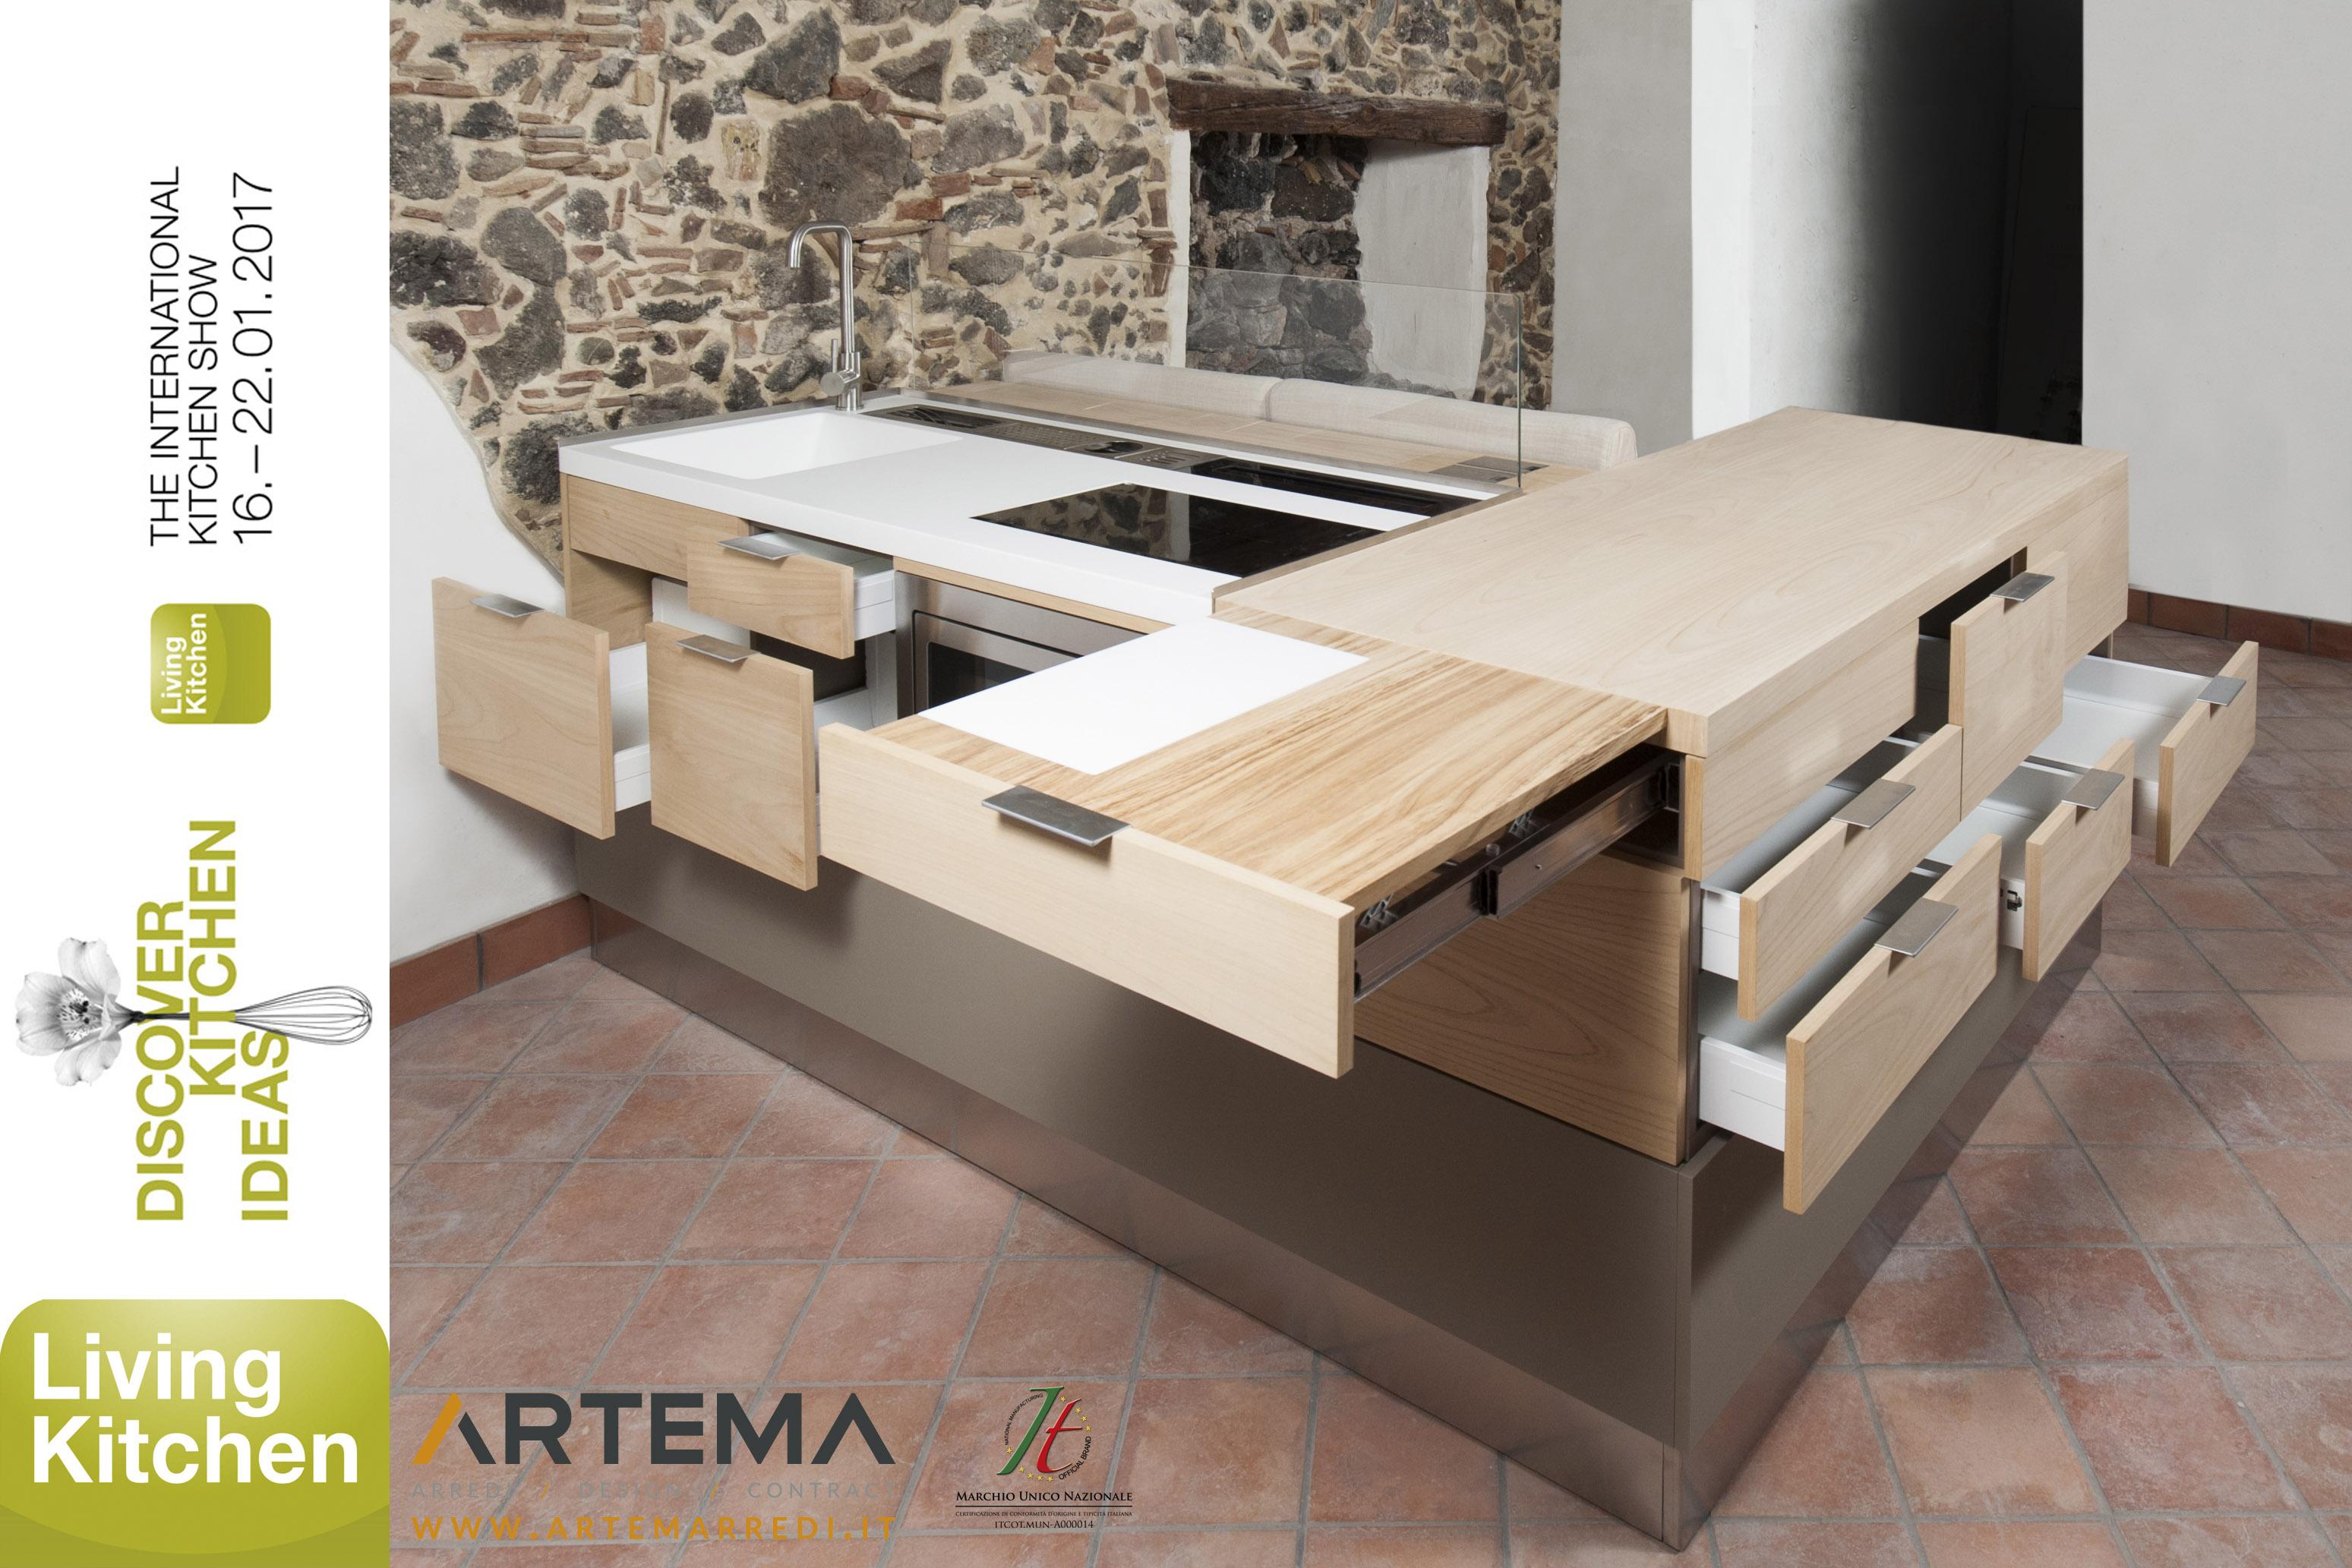 topstonedesign | by artema